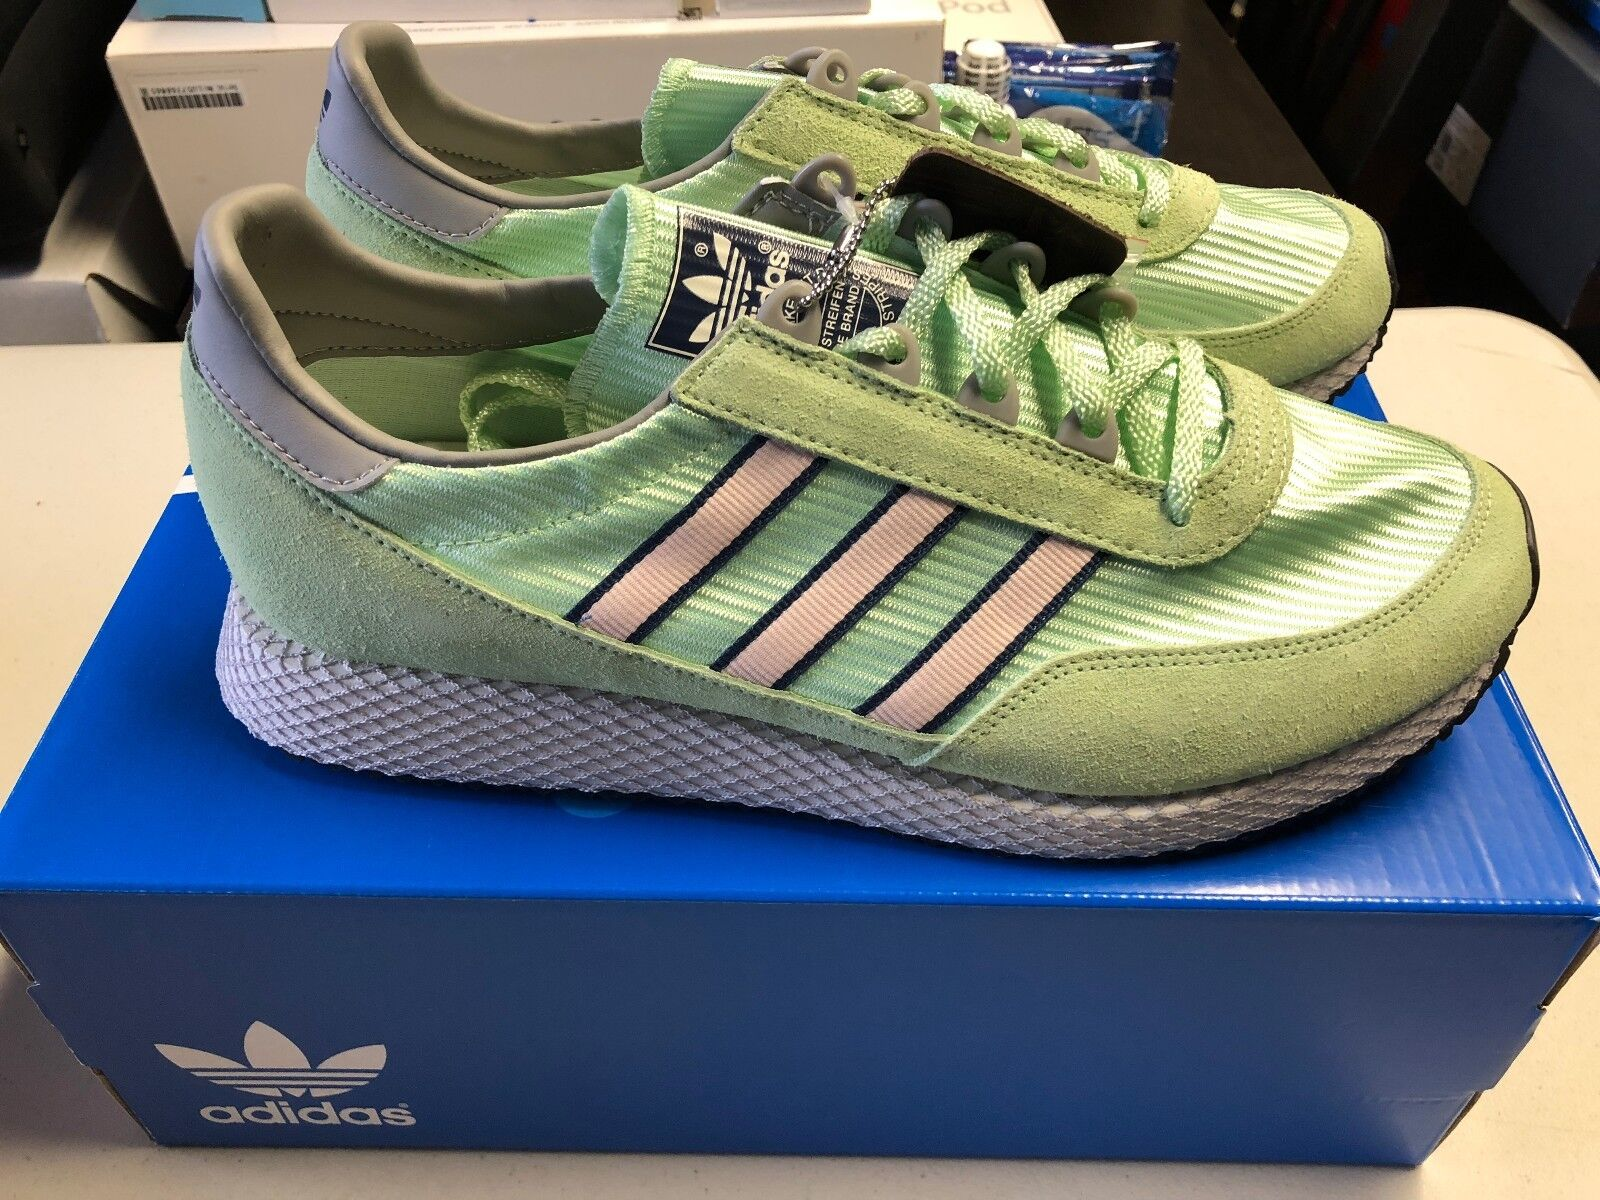 New Adidas Glenbuck SPZL Spezial Size 10.5 Mist Jade Green Icey Pink DA8759 NIB